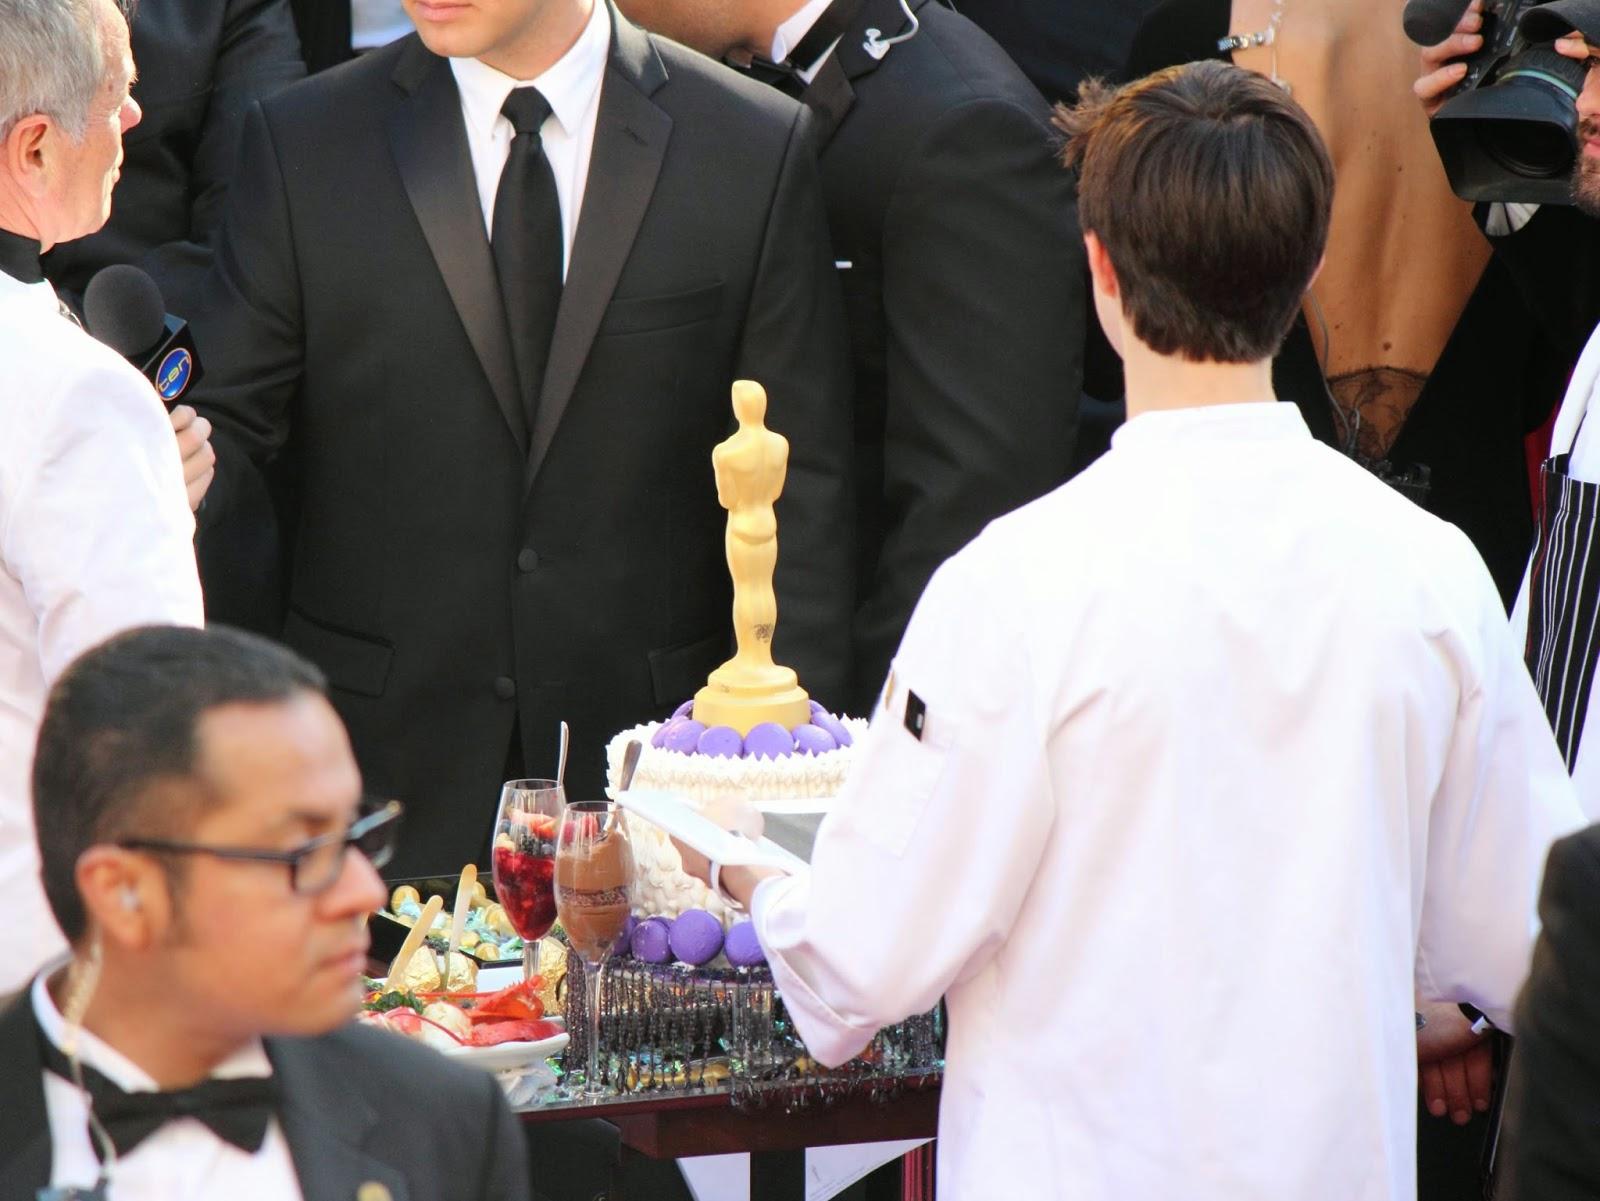 Oscar shaped desserts